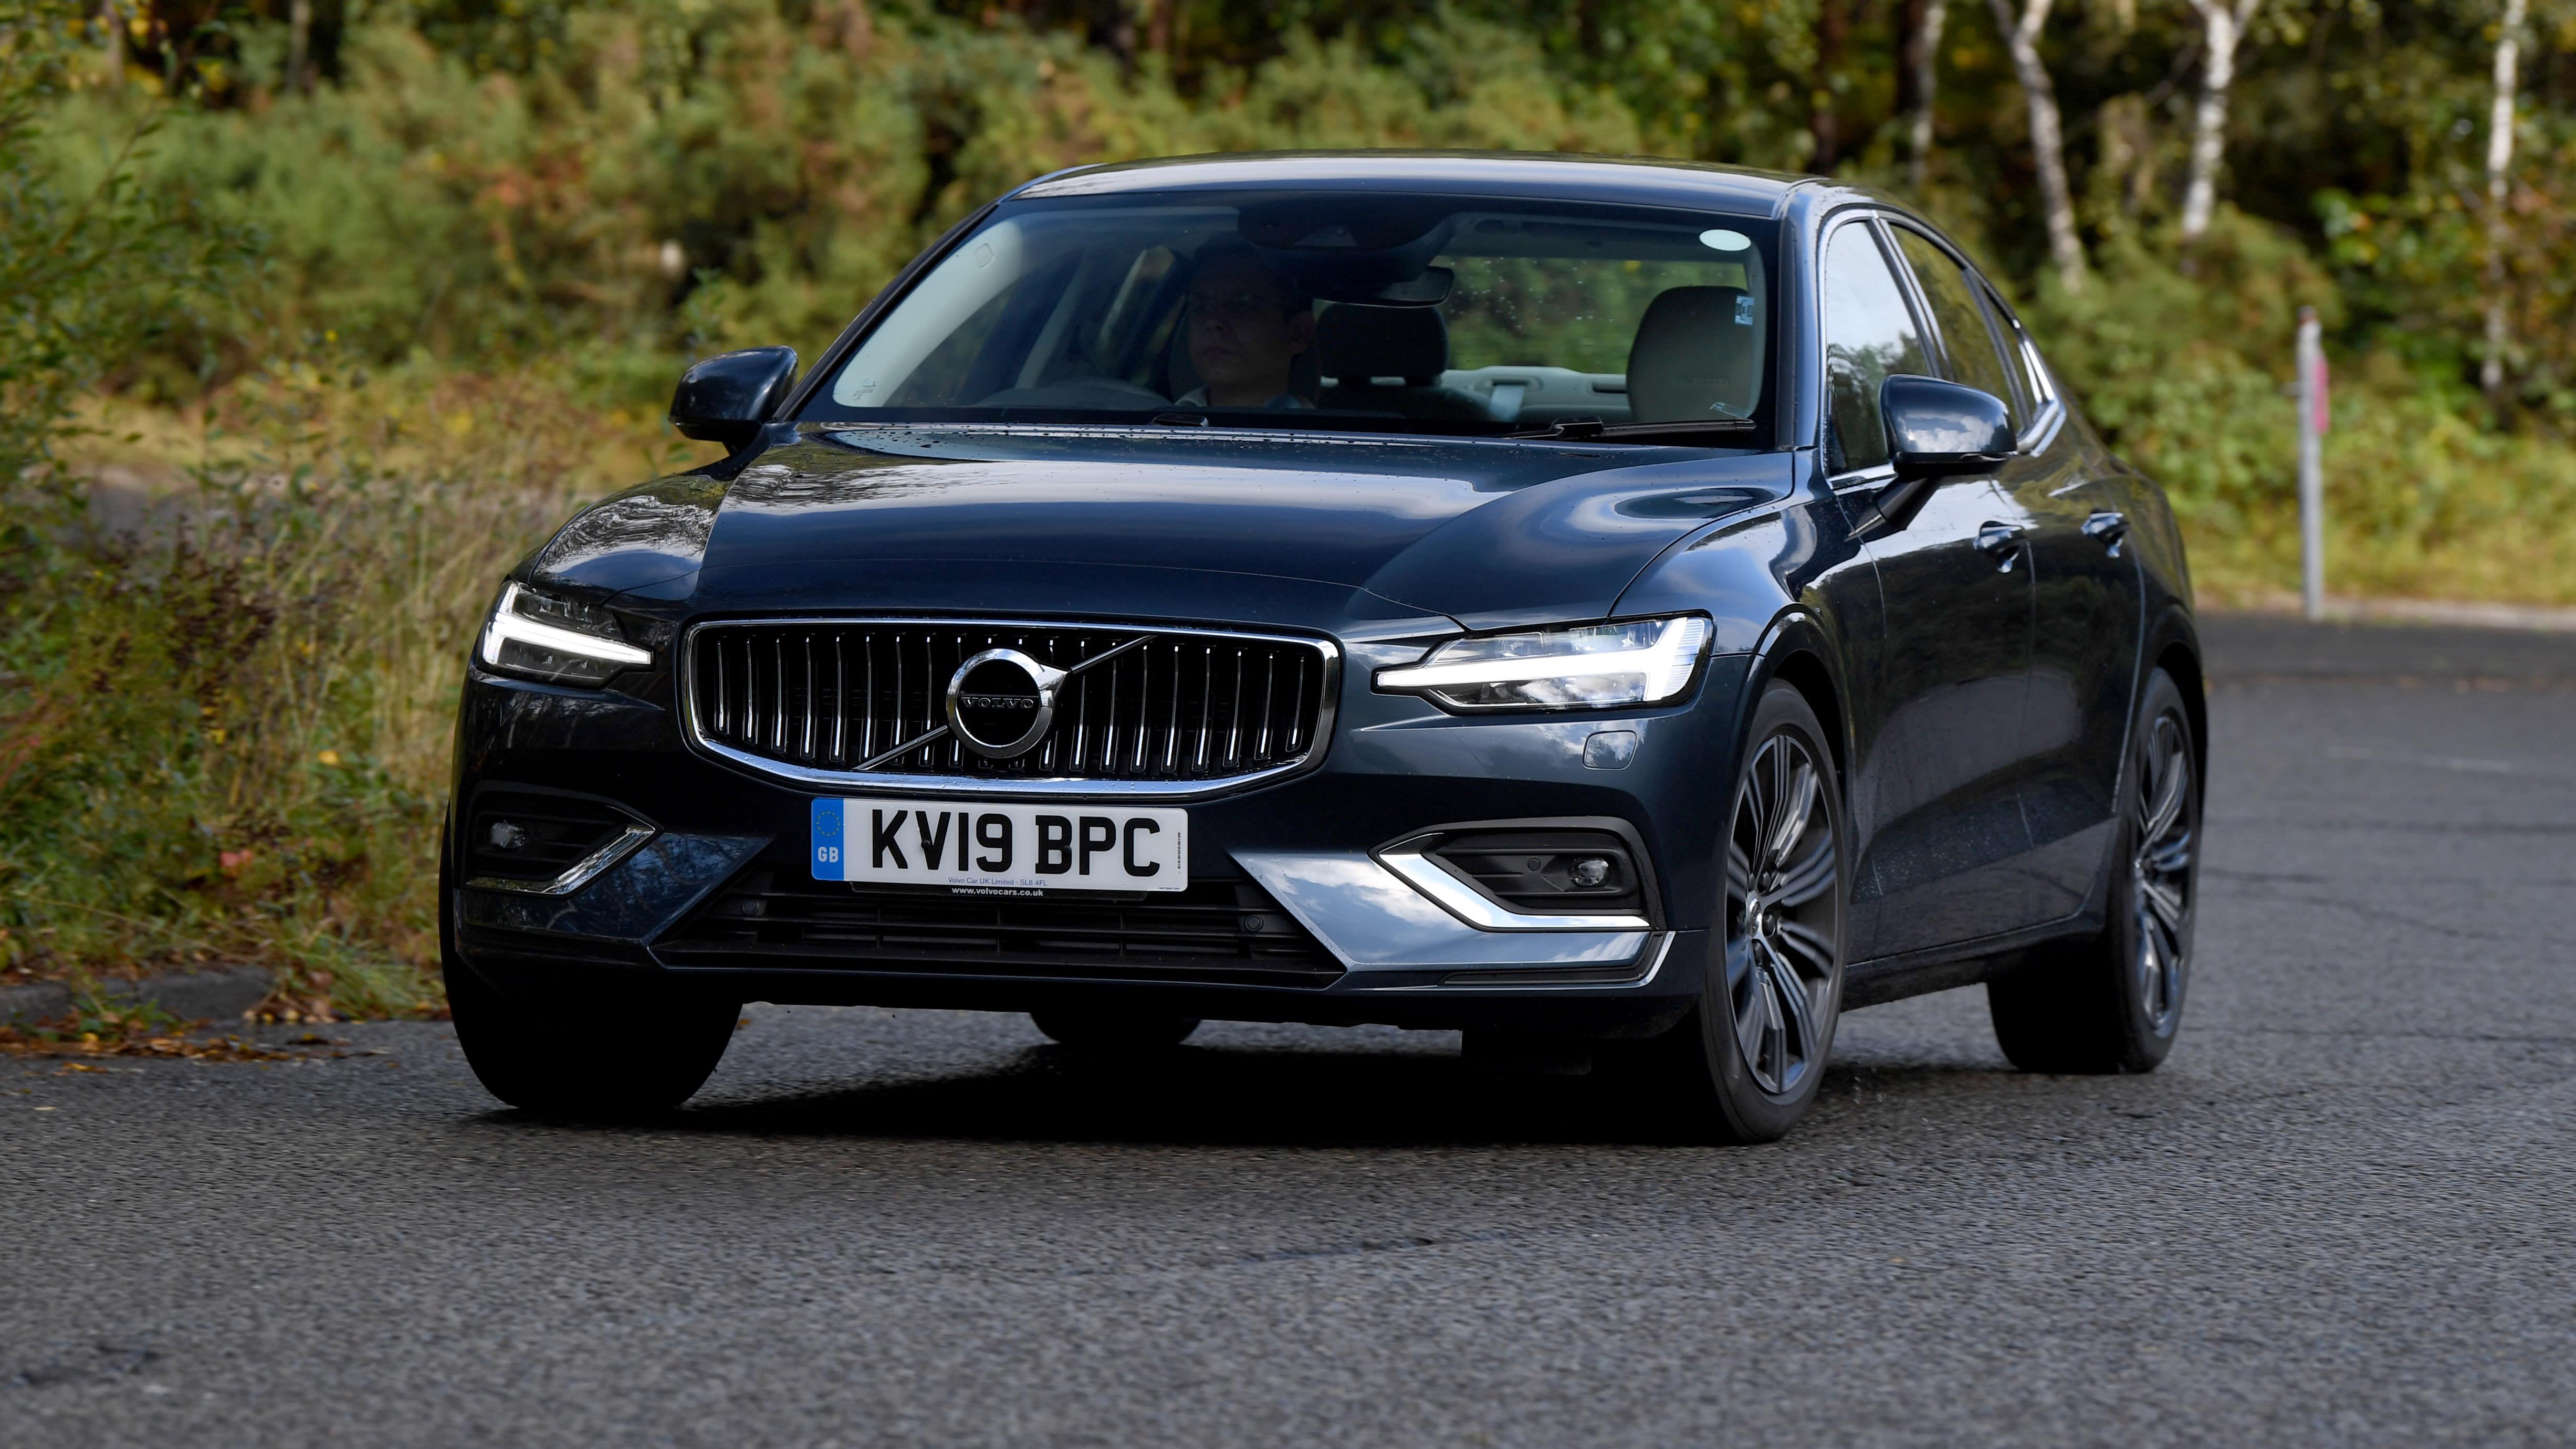 2022 Volvo S60 Australian Range To Be Slimmed Down With Mild Hybrid Petrol Power Caradvice